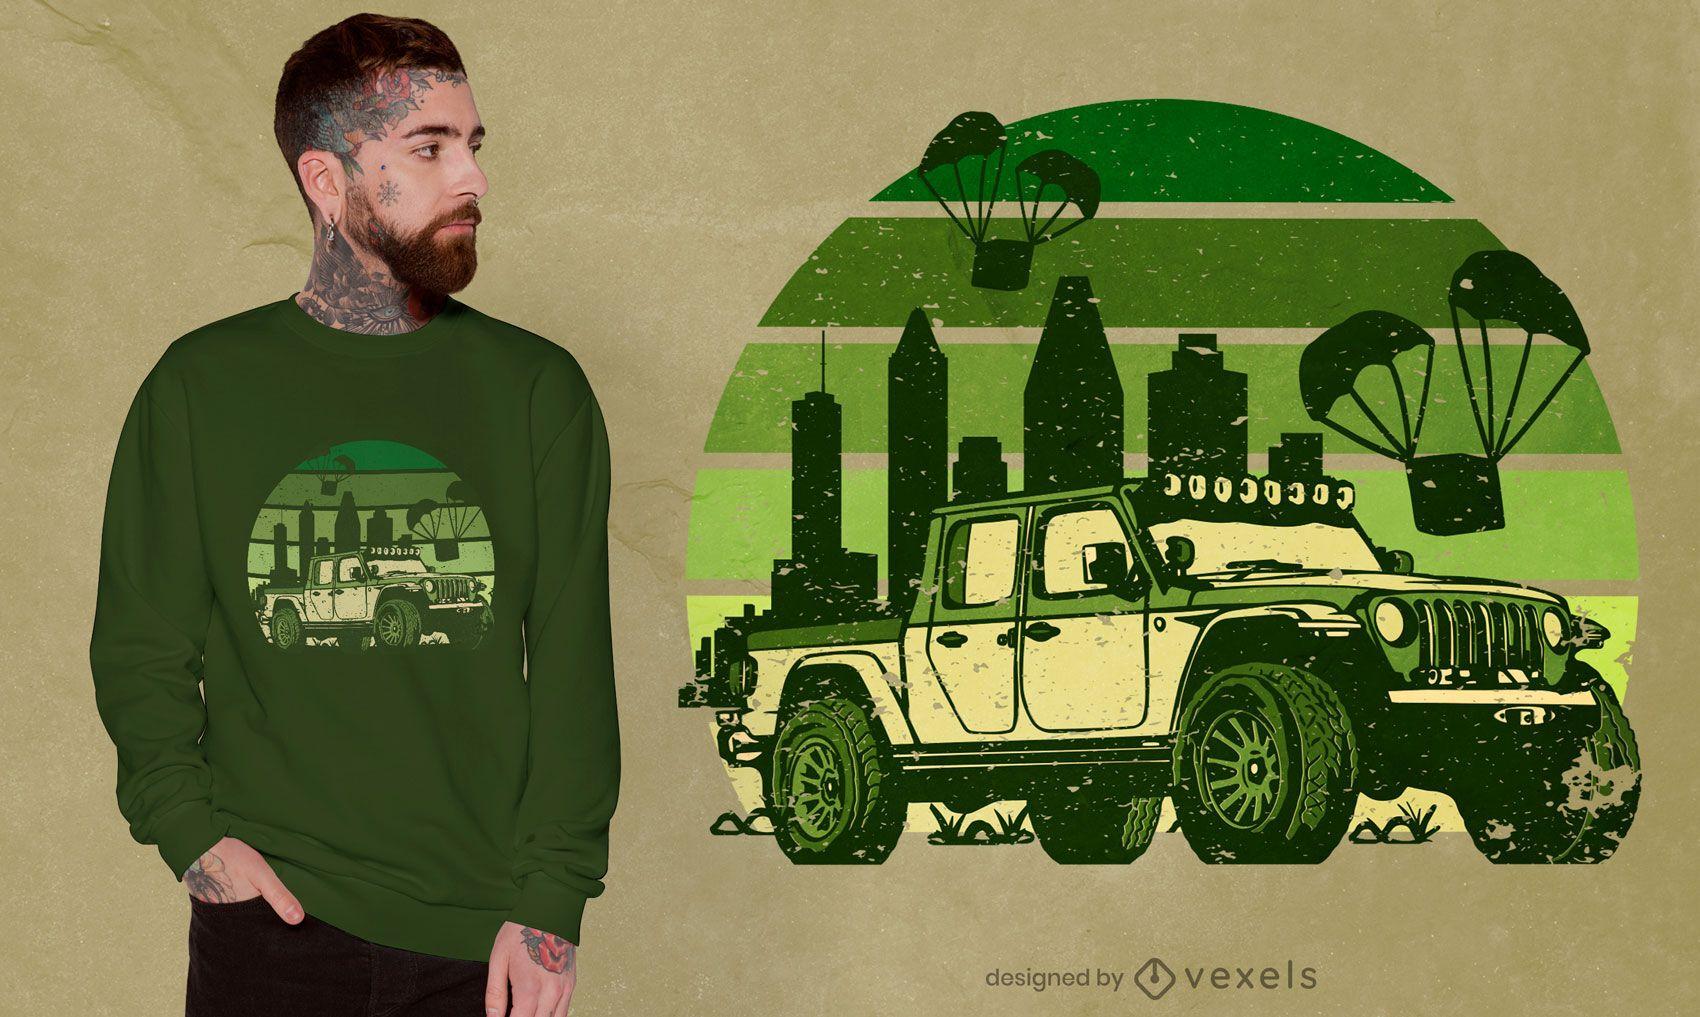 Off-road vehicle t-shirt design